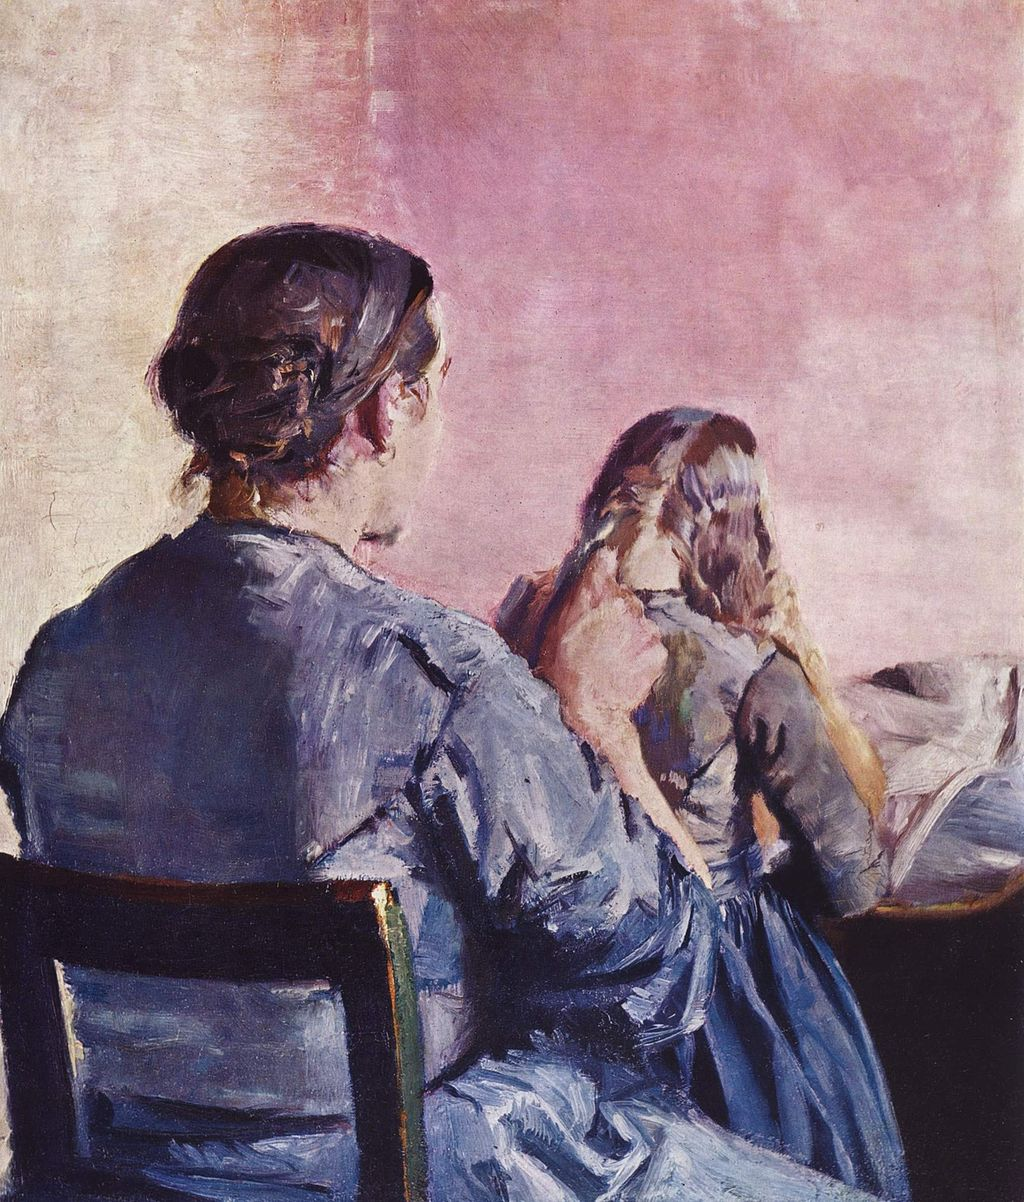 Christian Krohg, Håret flettes, år 1882. Foto via Wikipedia.